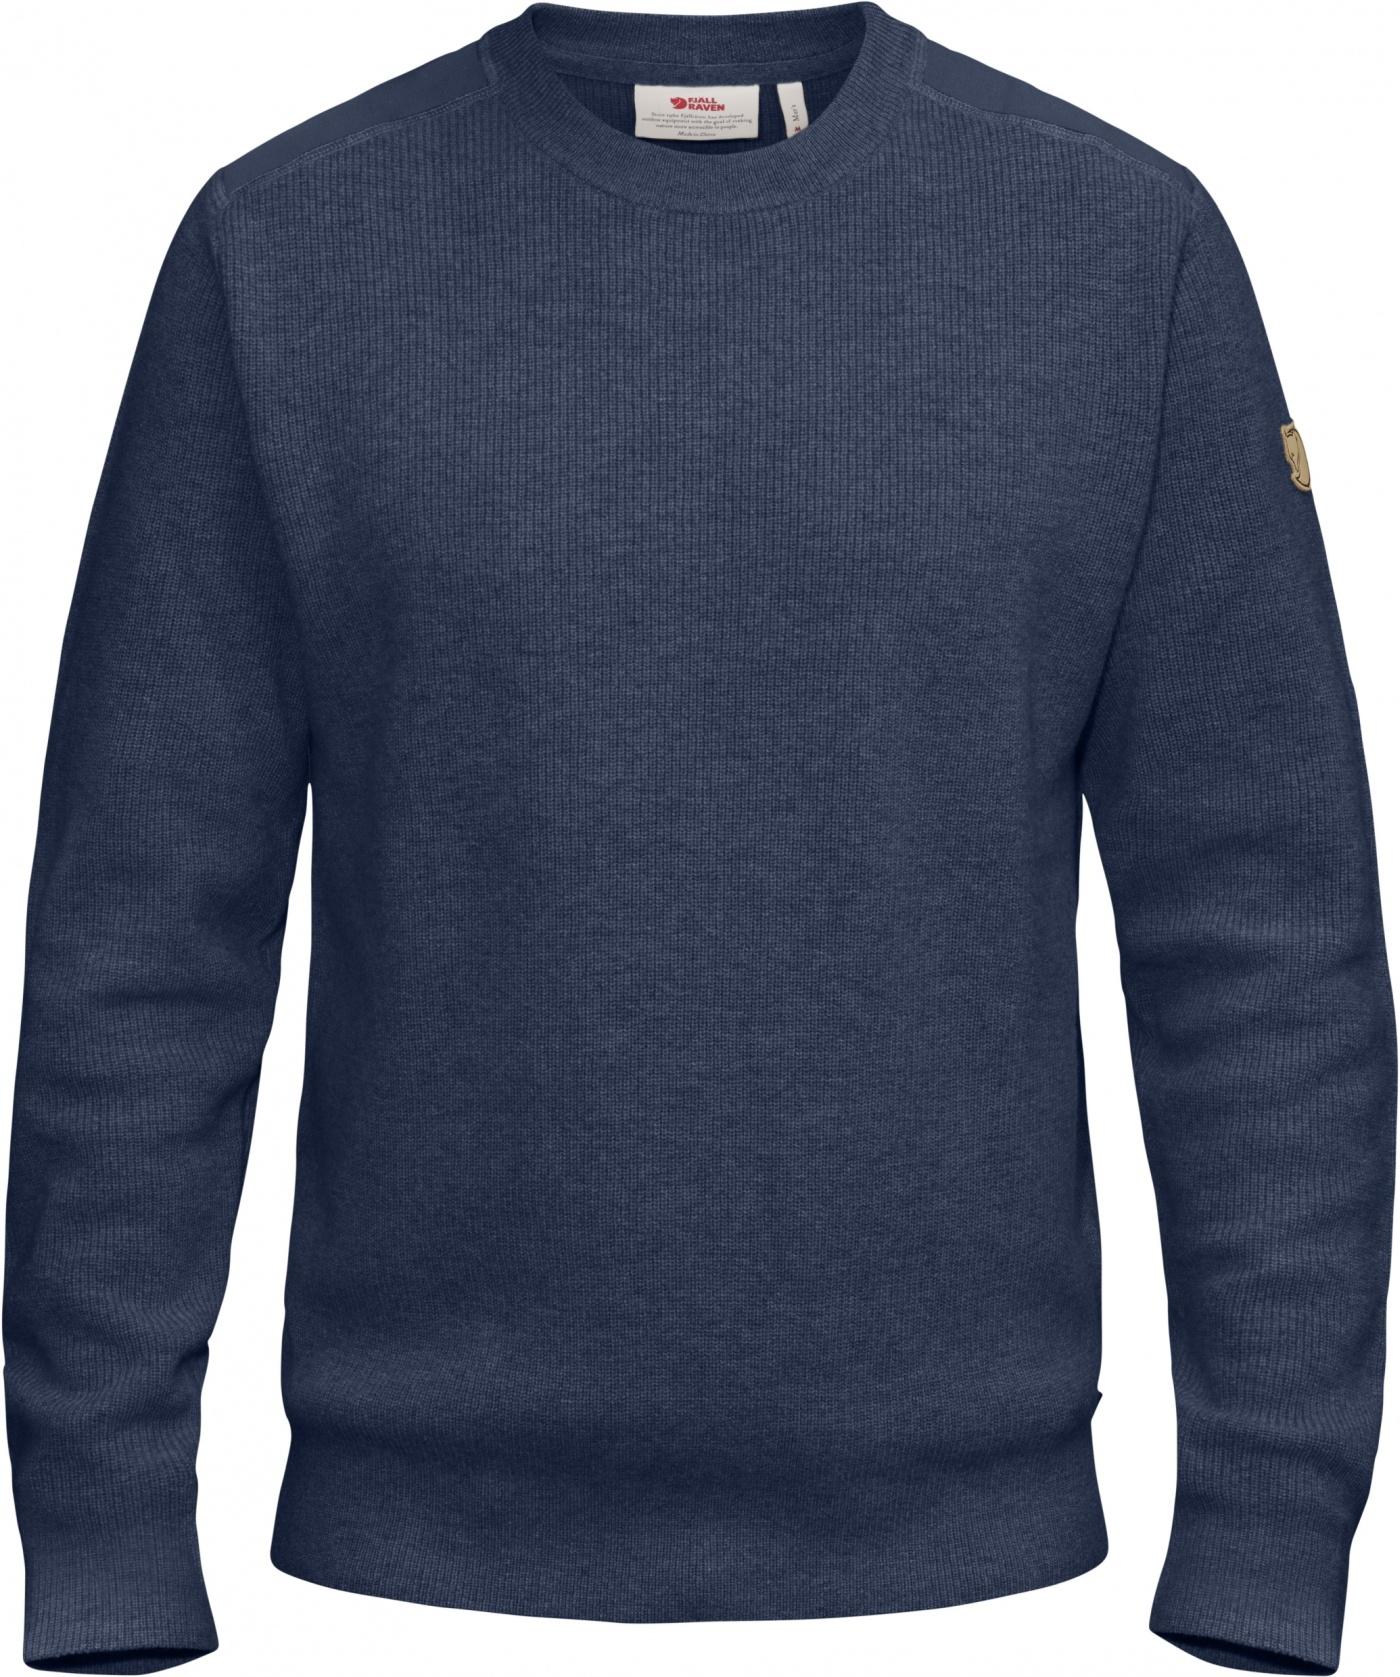 FjallRaven Sörmland Crew Sweater Storm-30